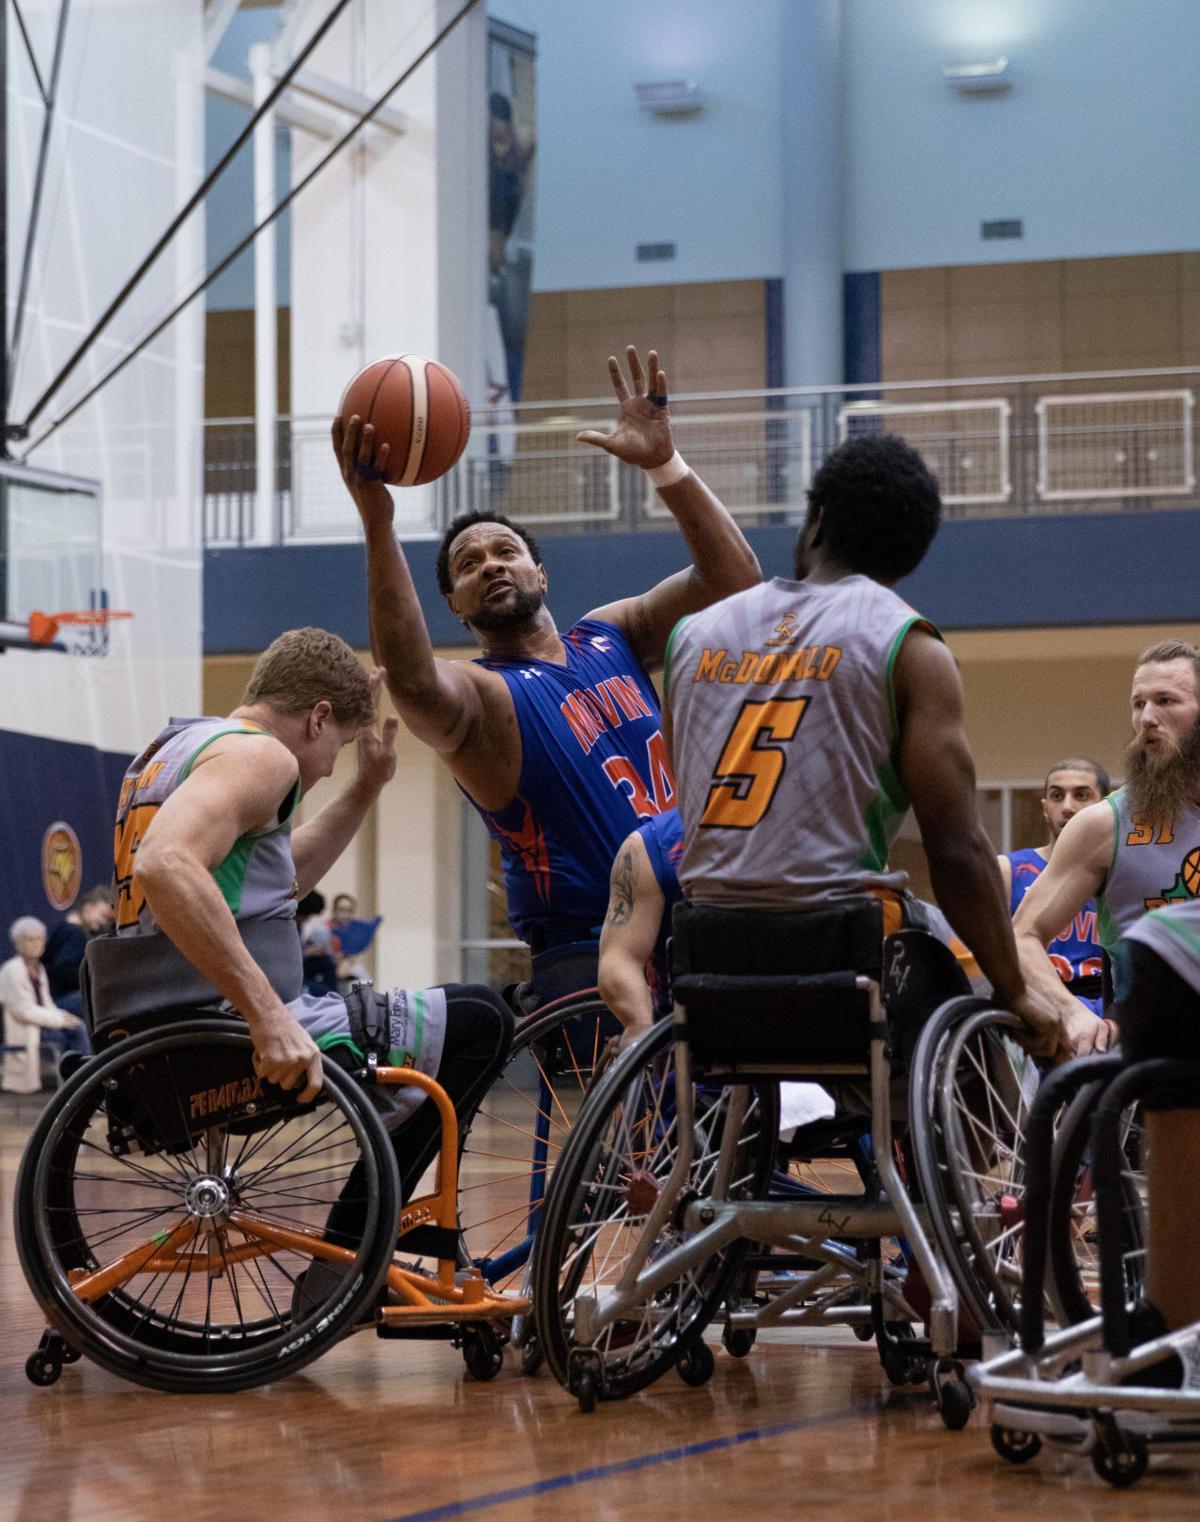 Movin' Mavs teams sweep Saturday's games in Dallas Invitational Wheelchair Basketball Tournament